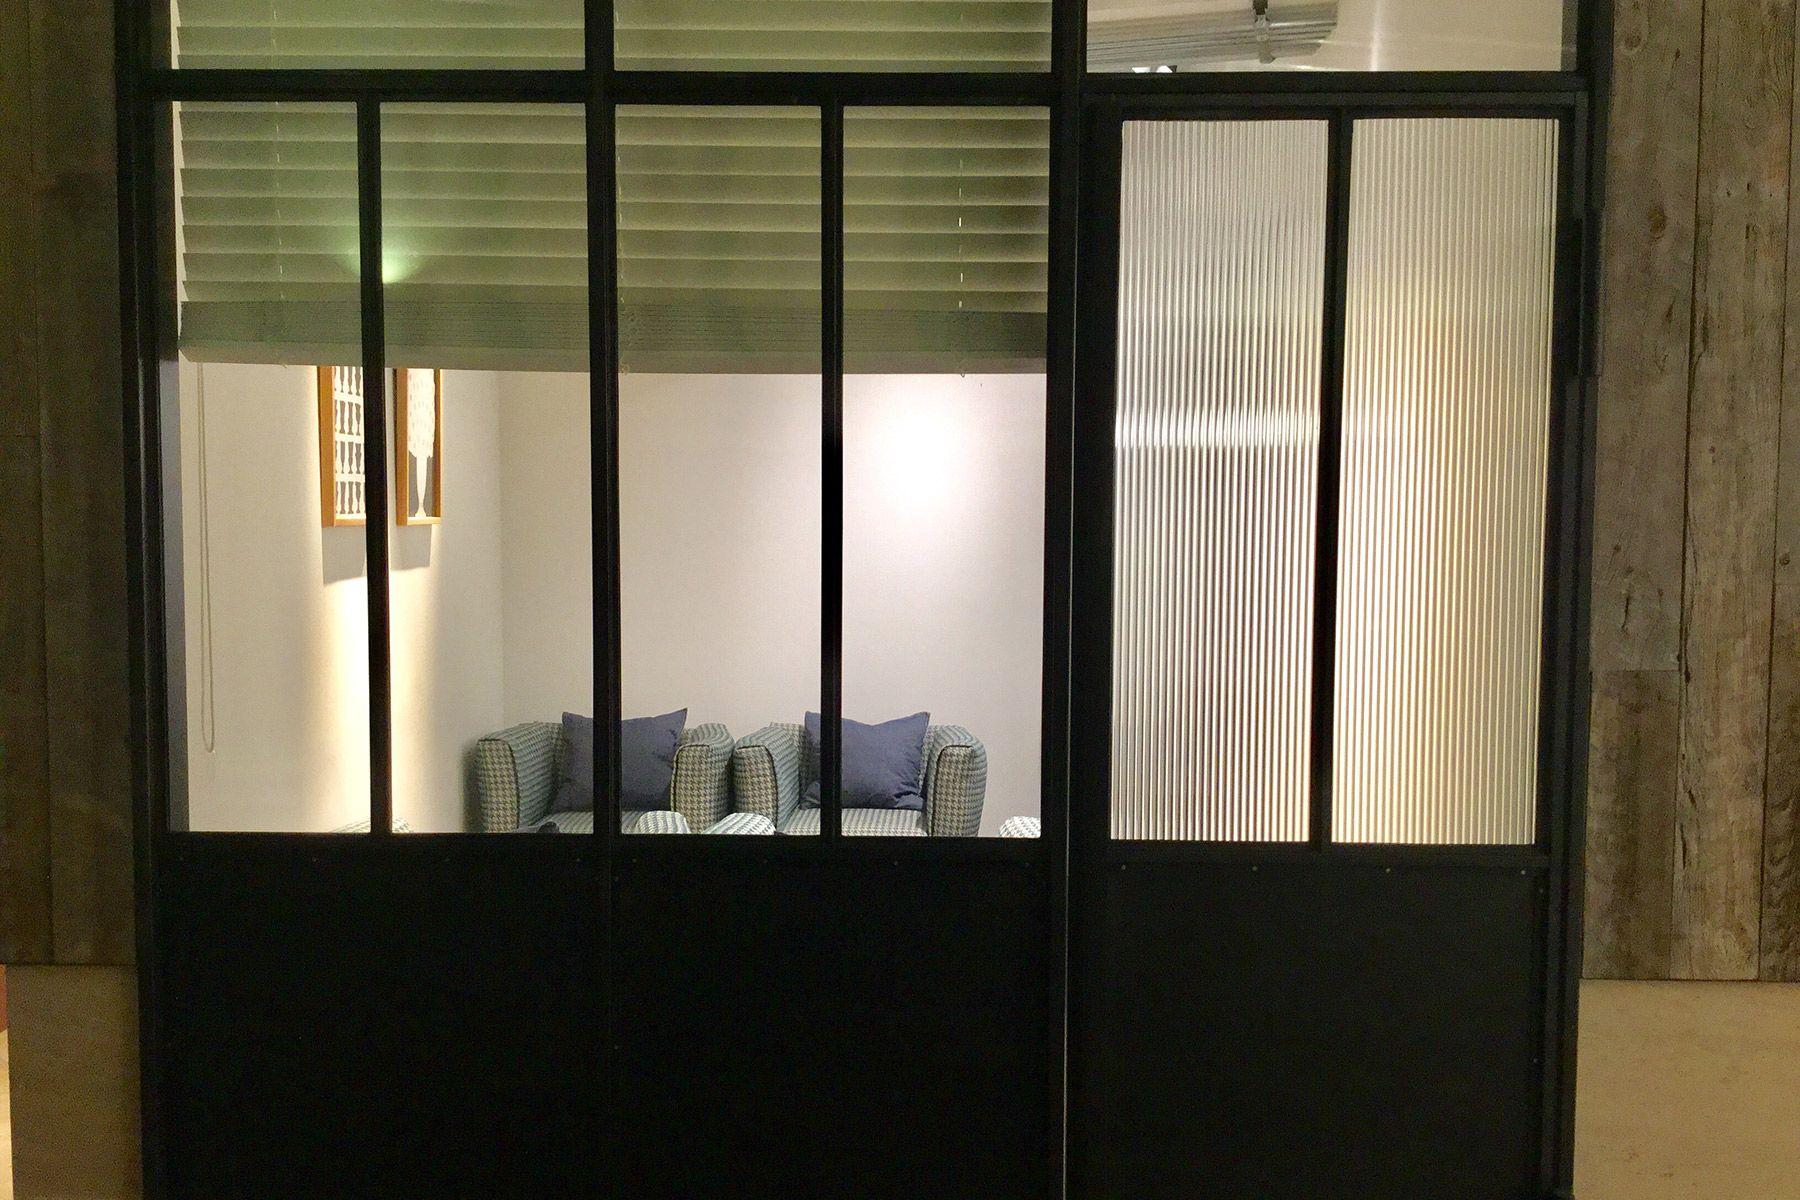 Brandze STUDIO(ブランゼスタジオ) インテリアショールーム内観12 応接室